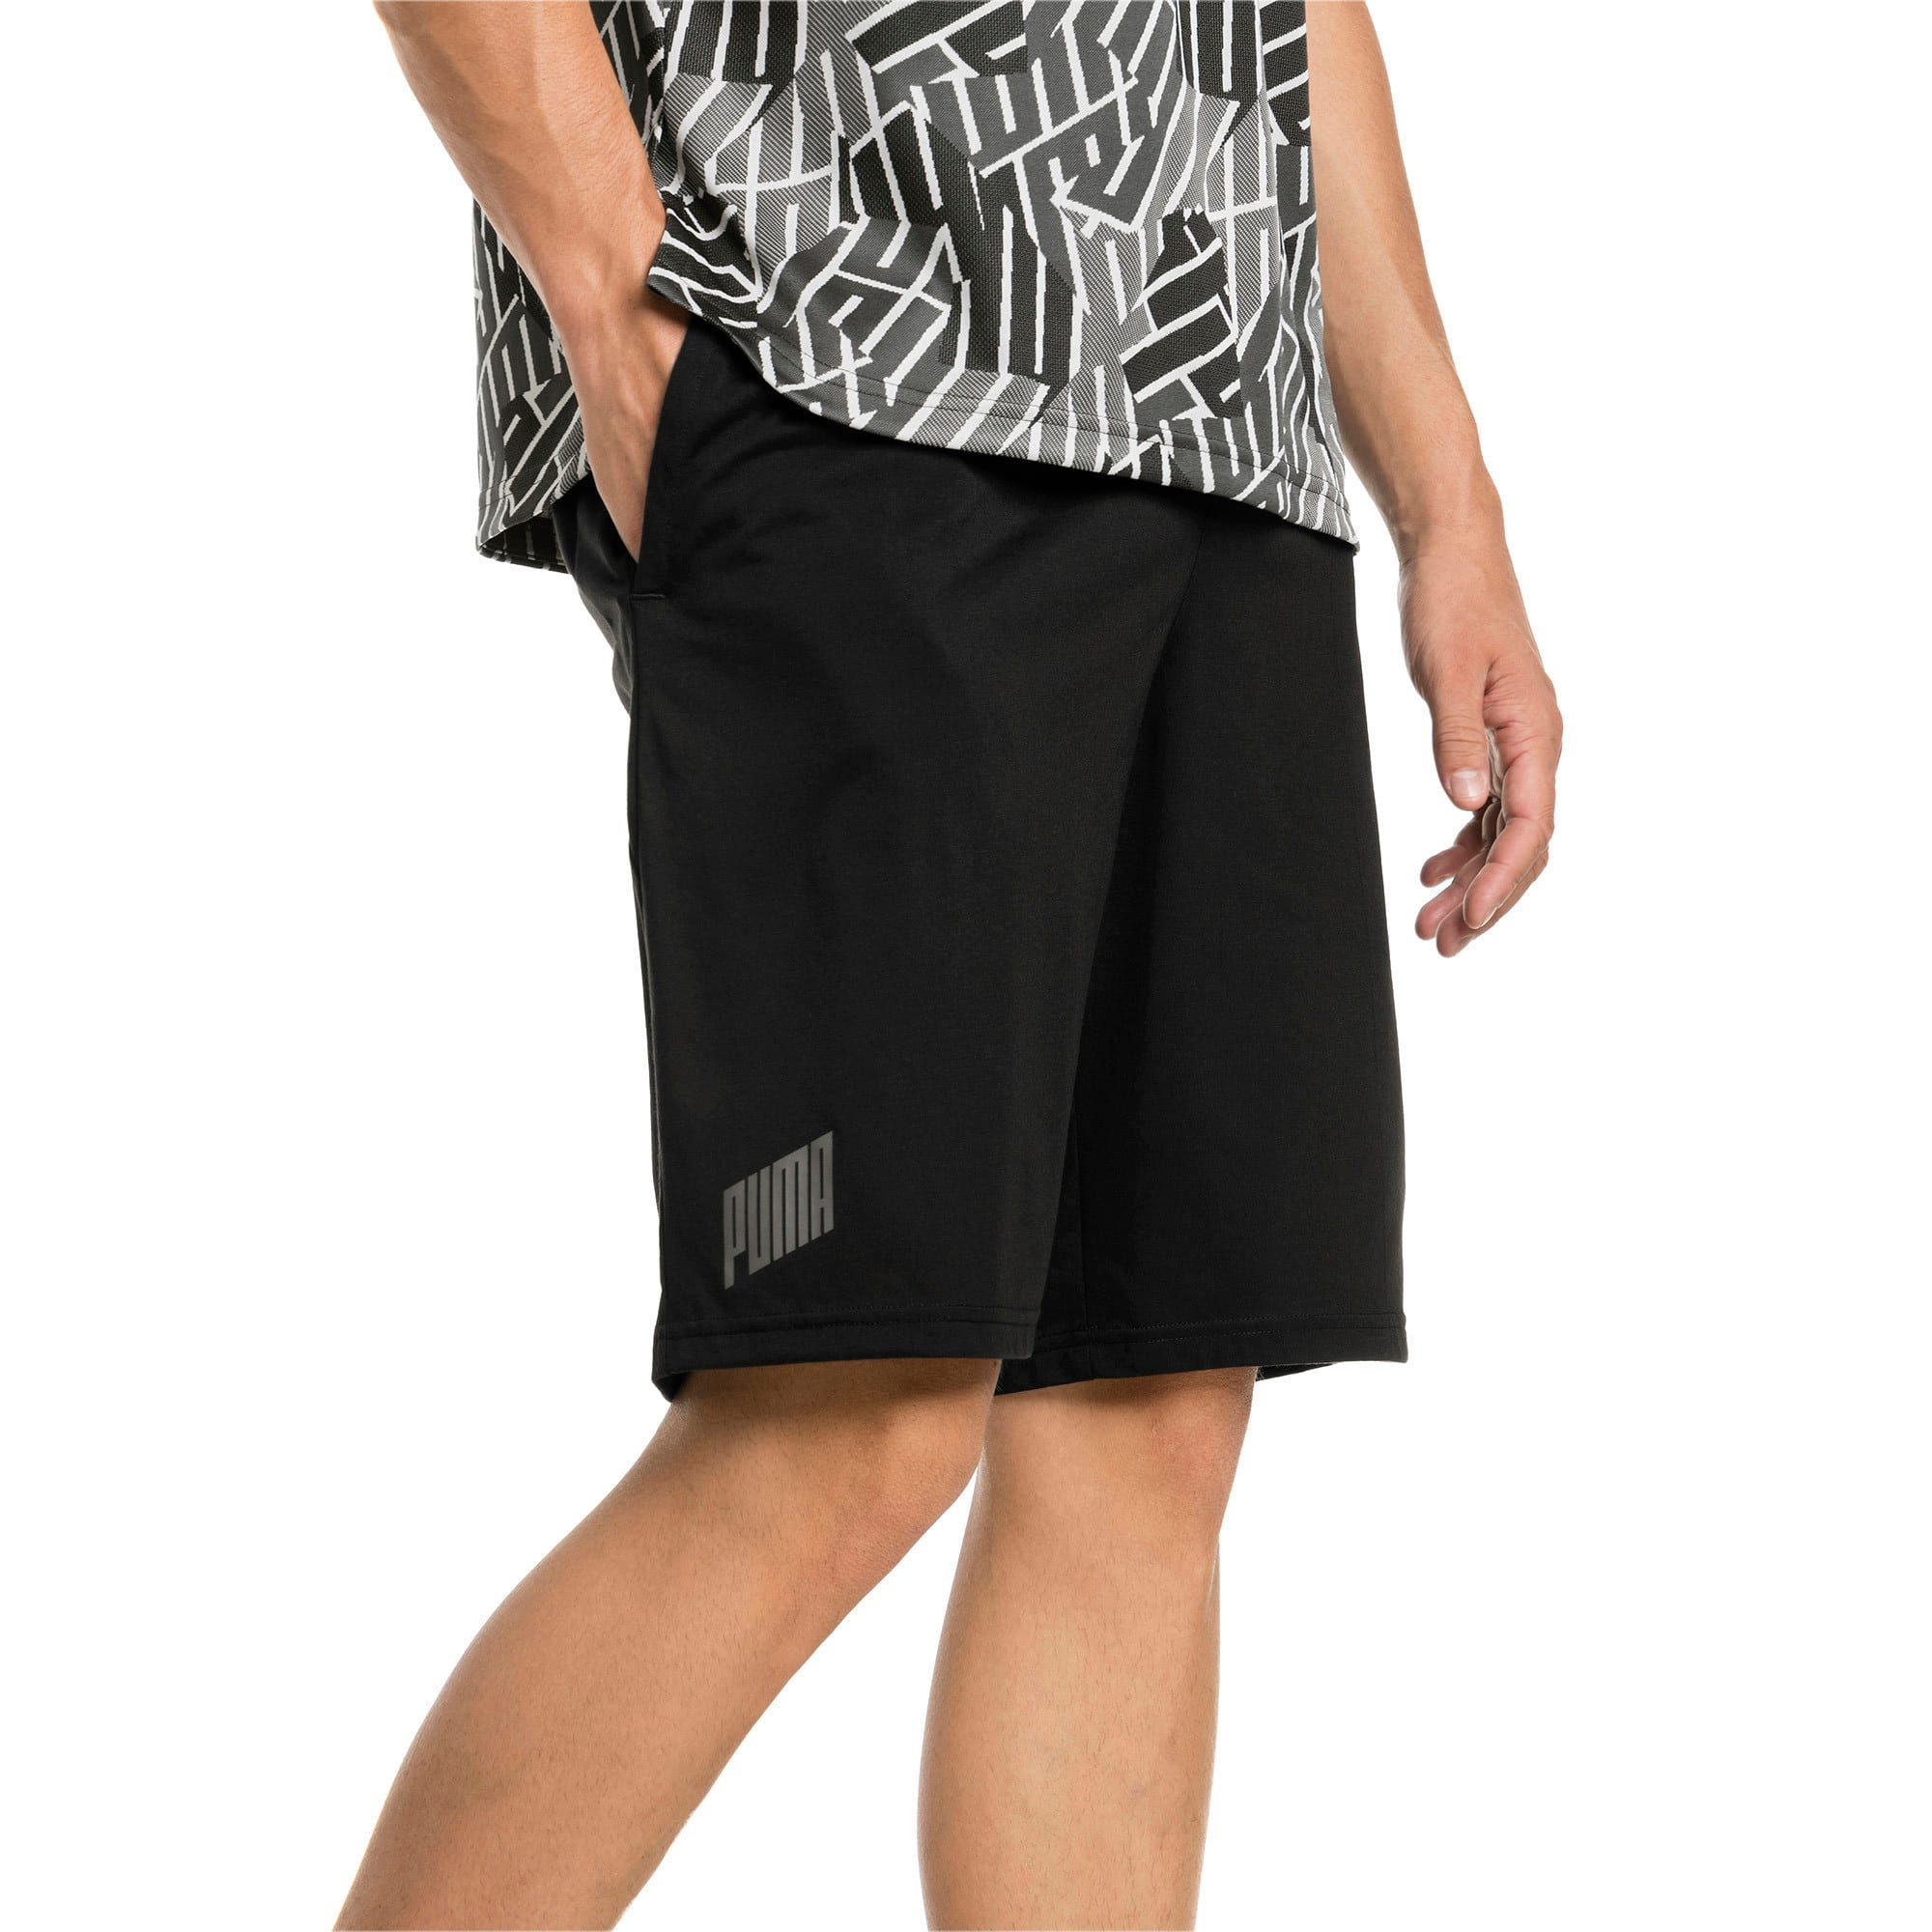 Thumbnail 1 of A.C.E. Knitted Men's Shorts, Puma Black, medium